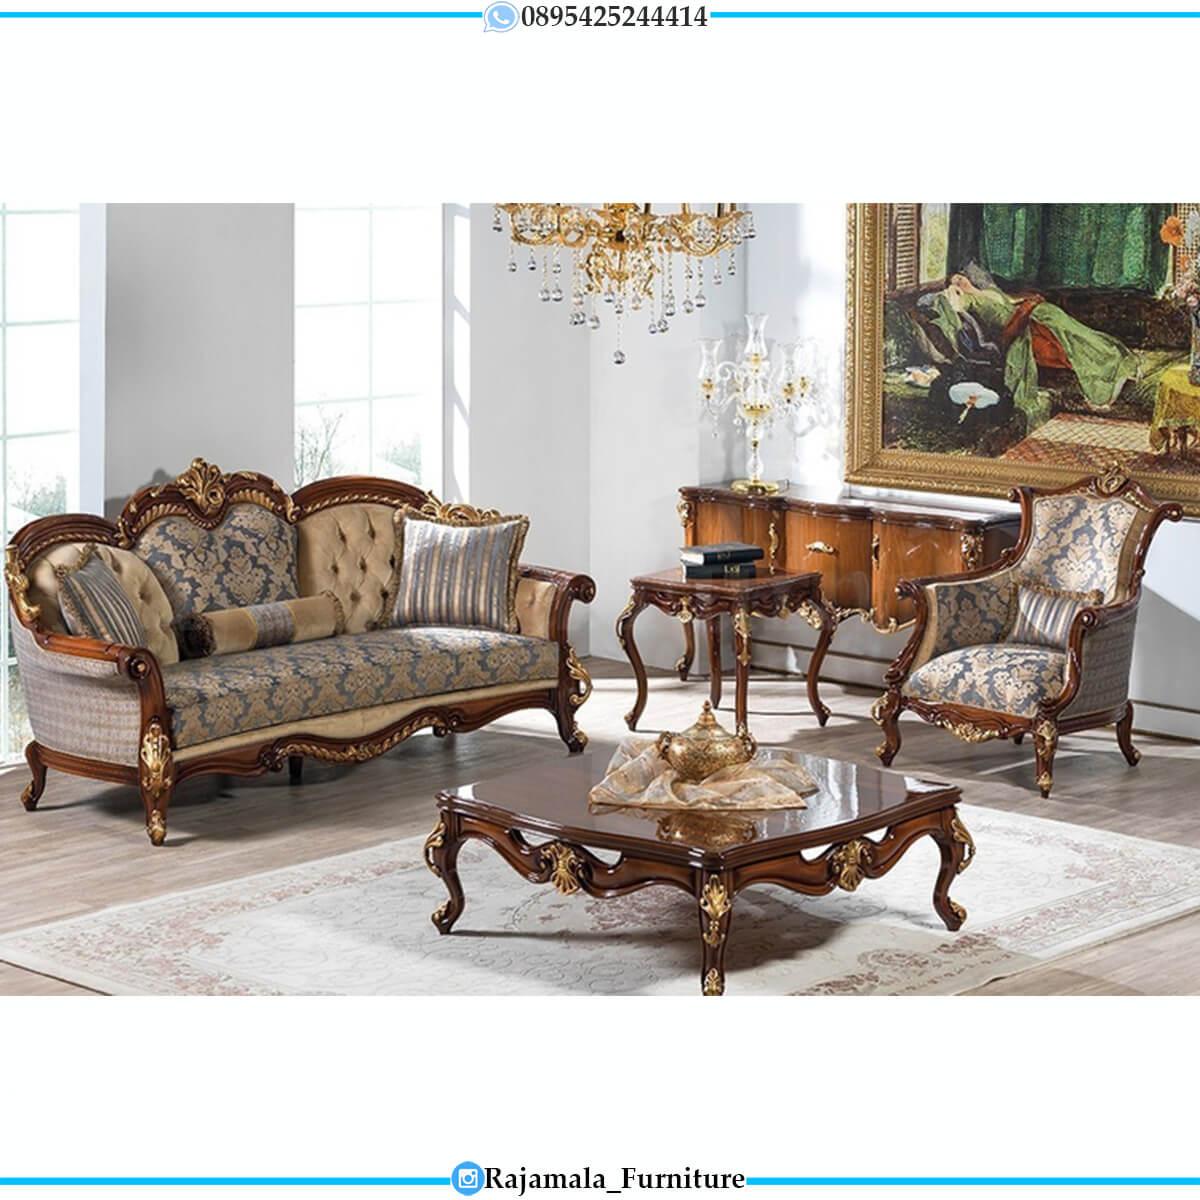 Set Sofa Mewah Jepara Luxurious Carving Design Greatest RM-0743